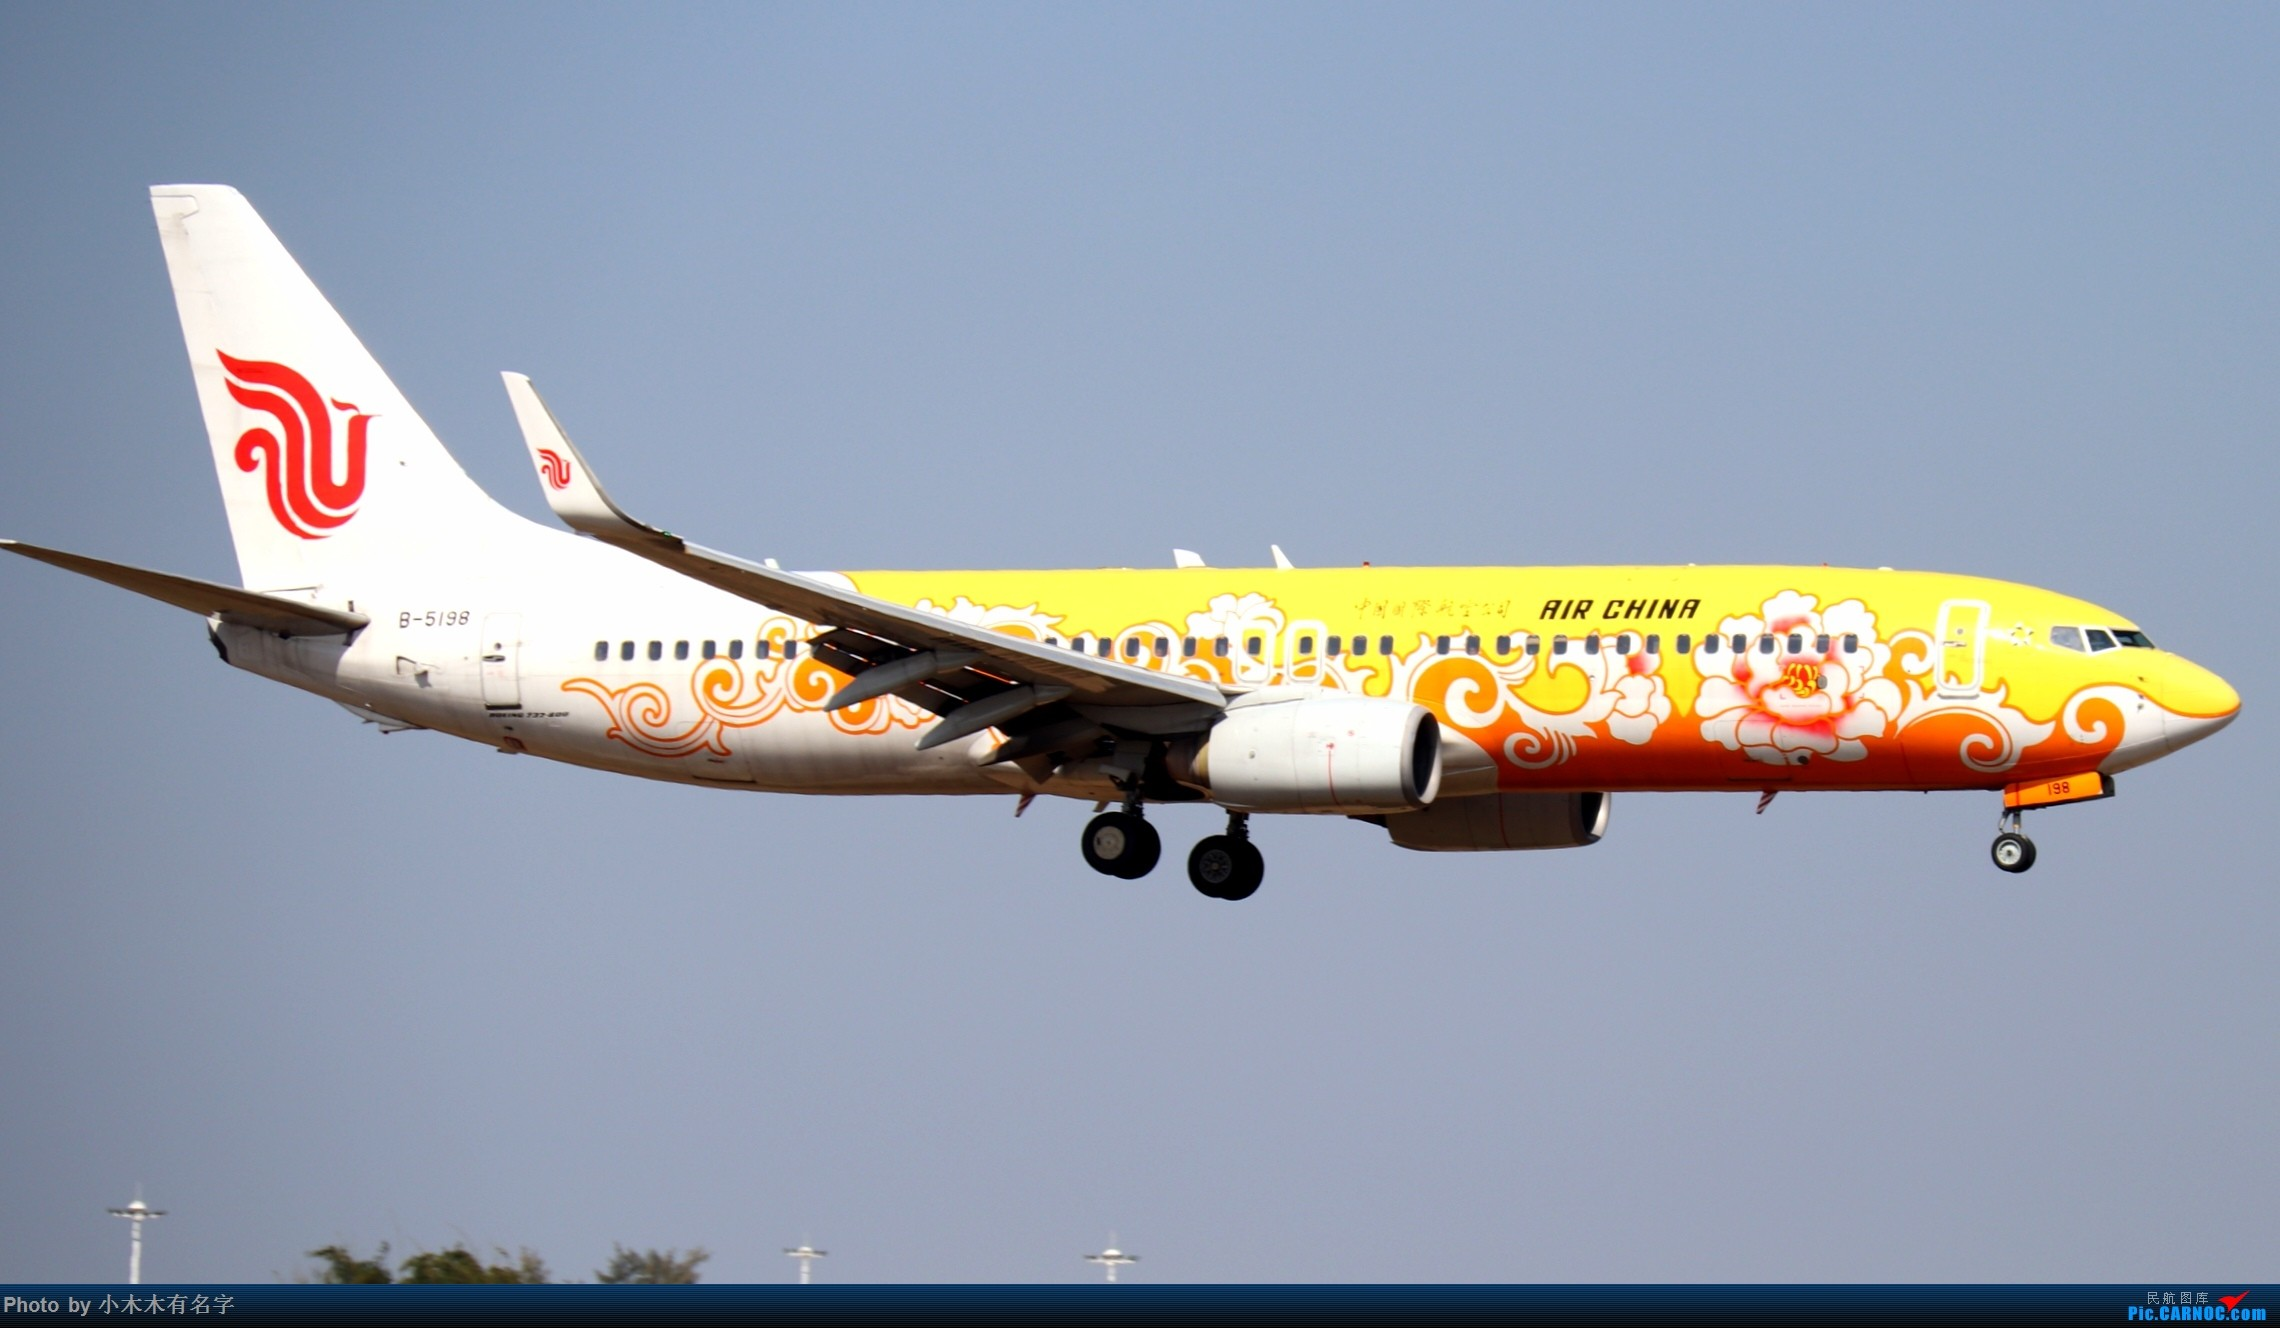 Re:[原创]2019冬天的海口美兰 BOEING 737-800 B-5198 中国海口美兰国际机场